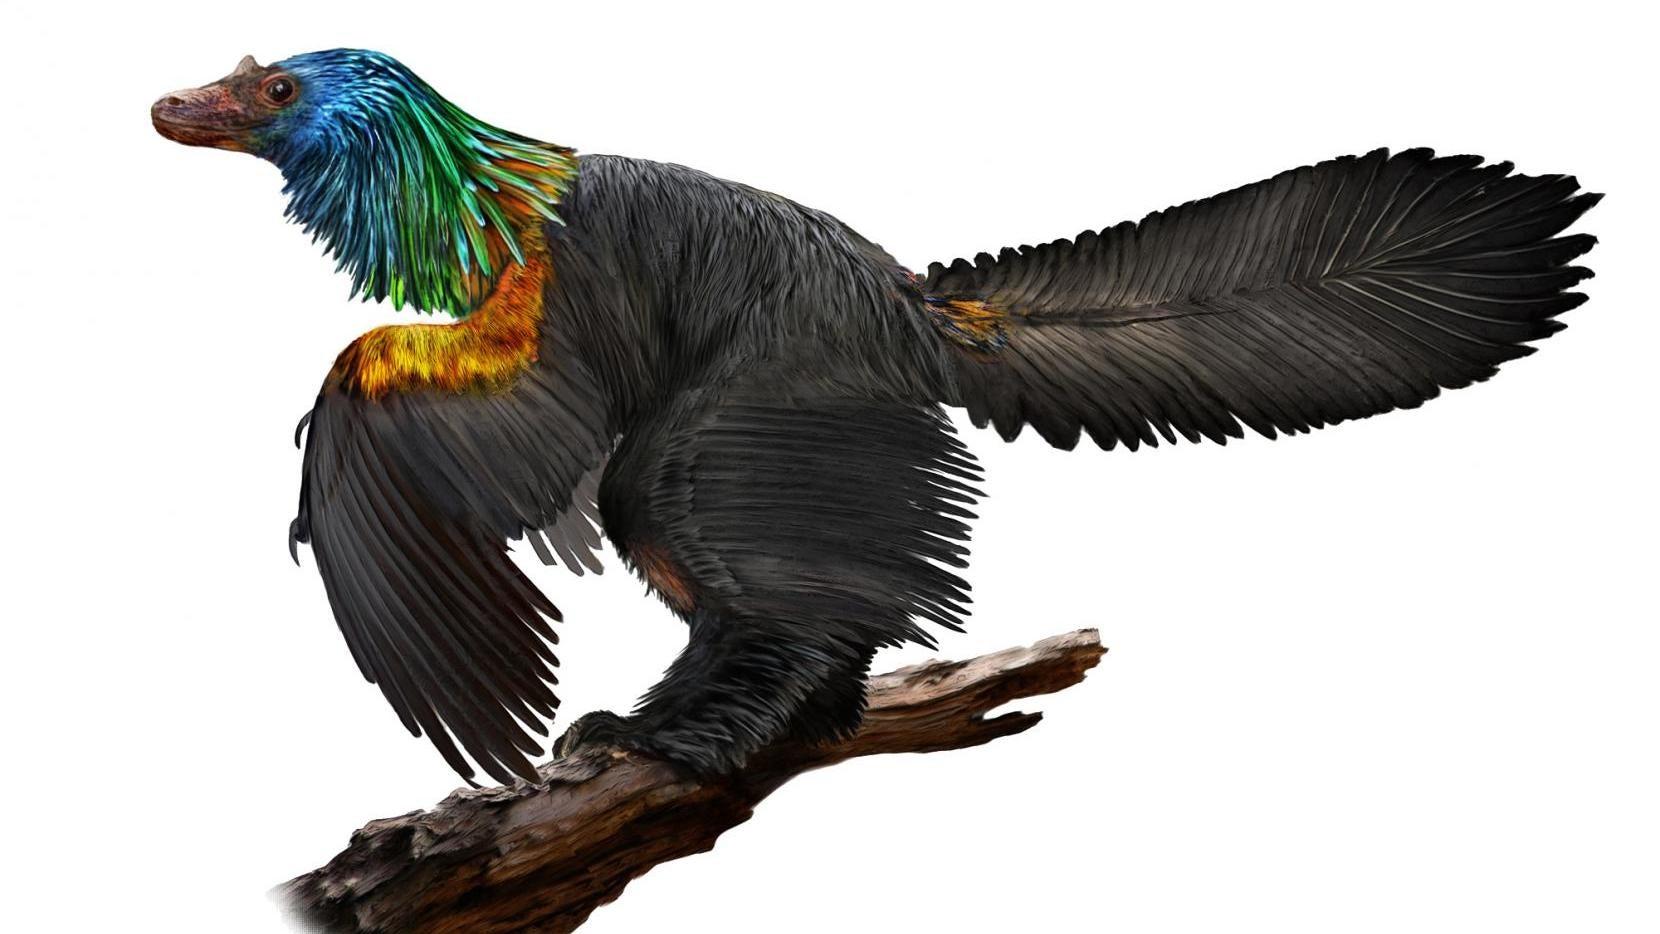 This Bird-Like Dinosaur Featured A Stunning Rainbow-Coloured Mane